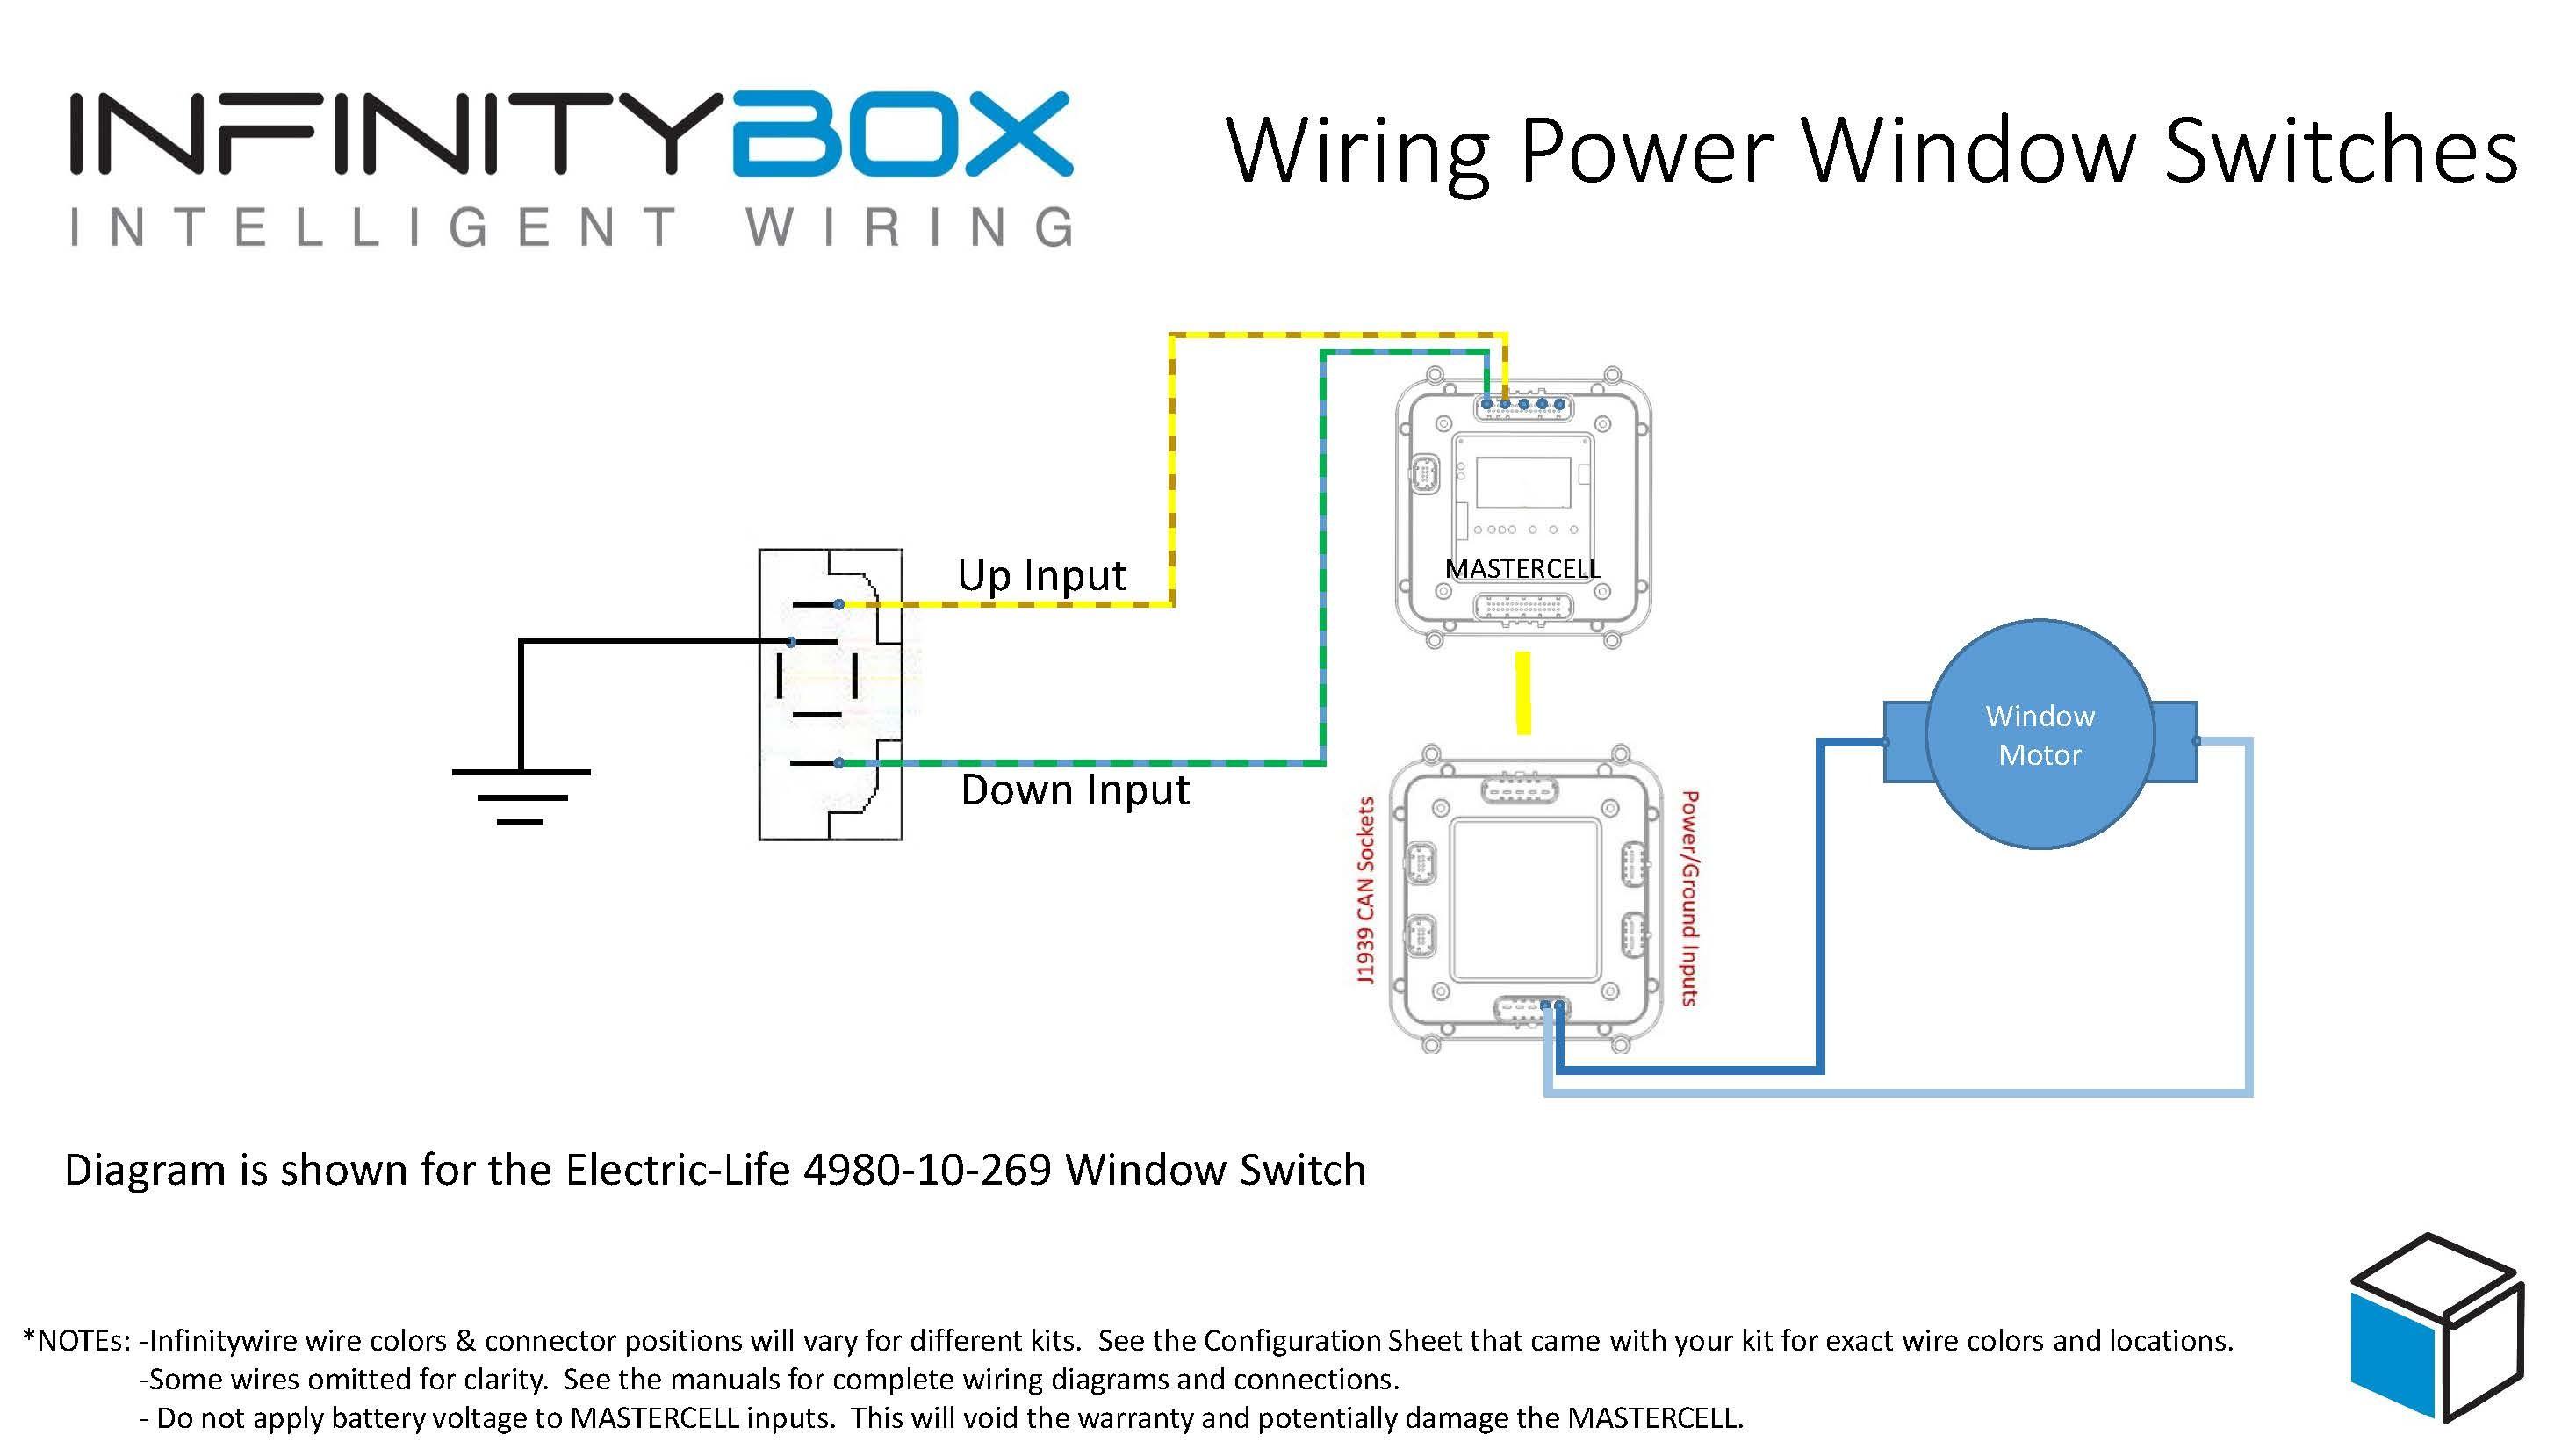 Power Window Switch Diagram Amazing Vehicle Wiring Information ...